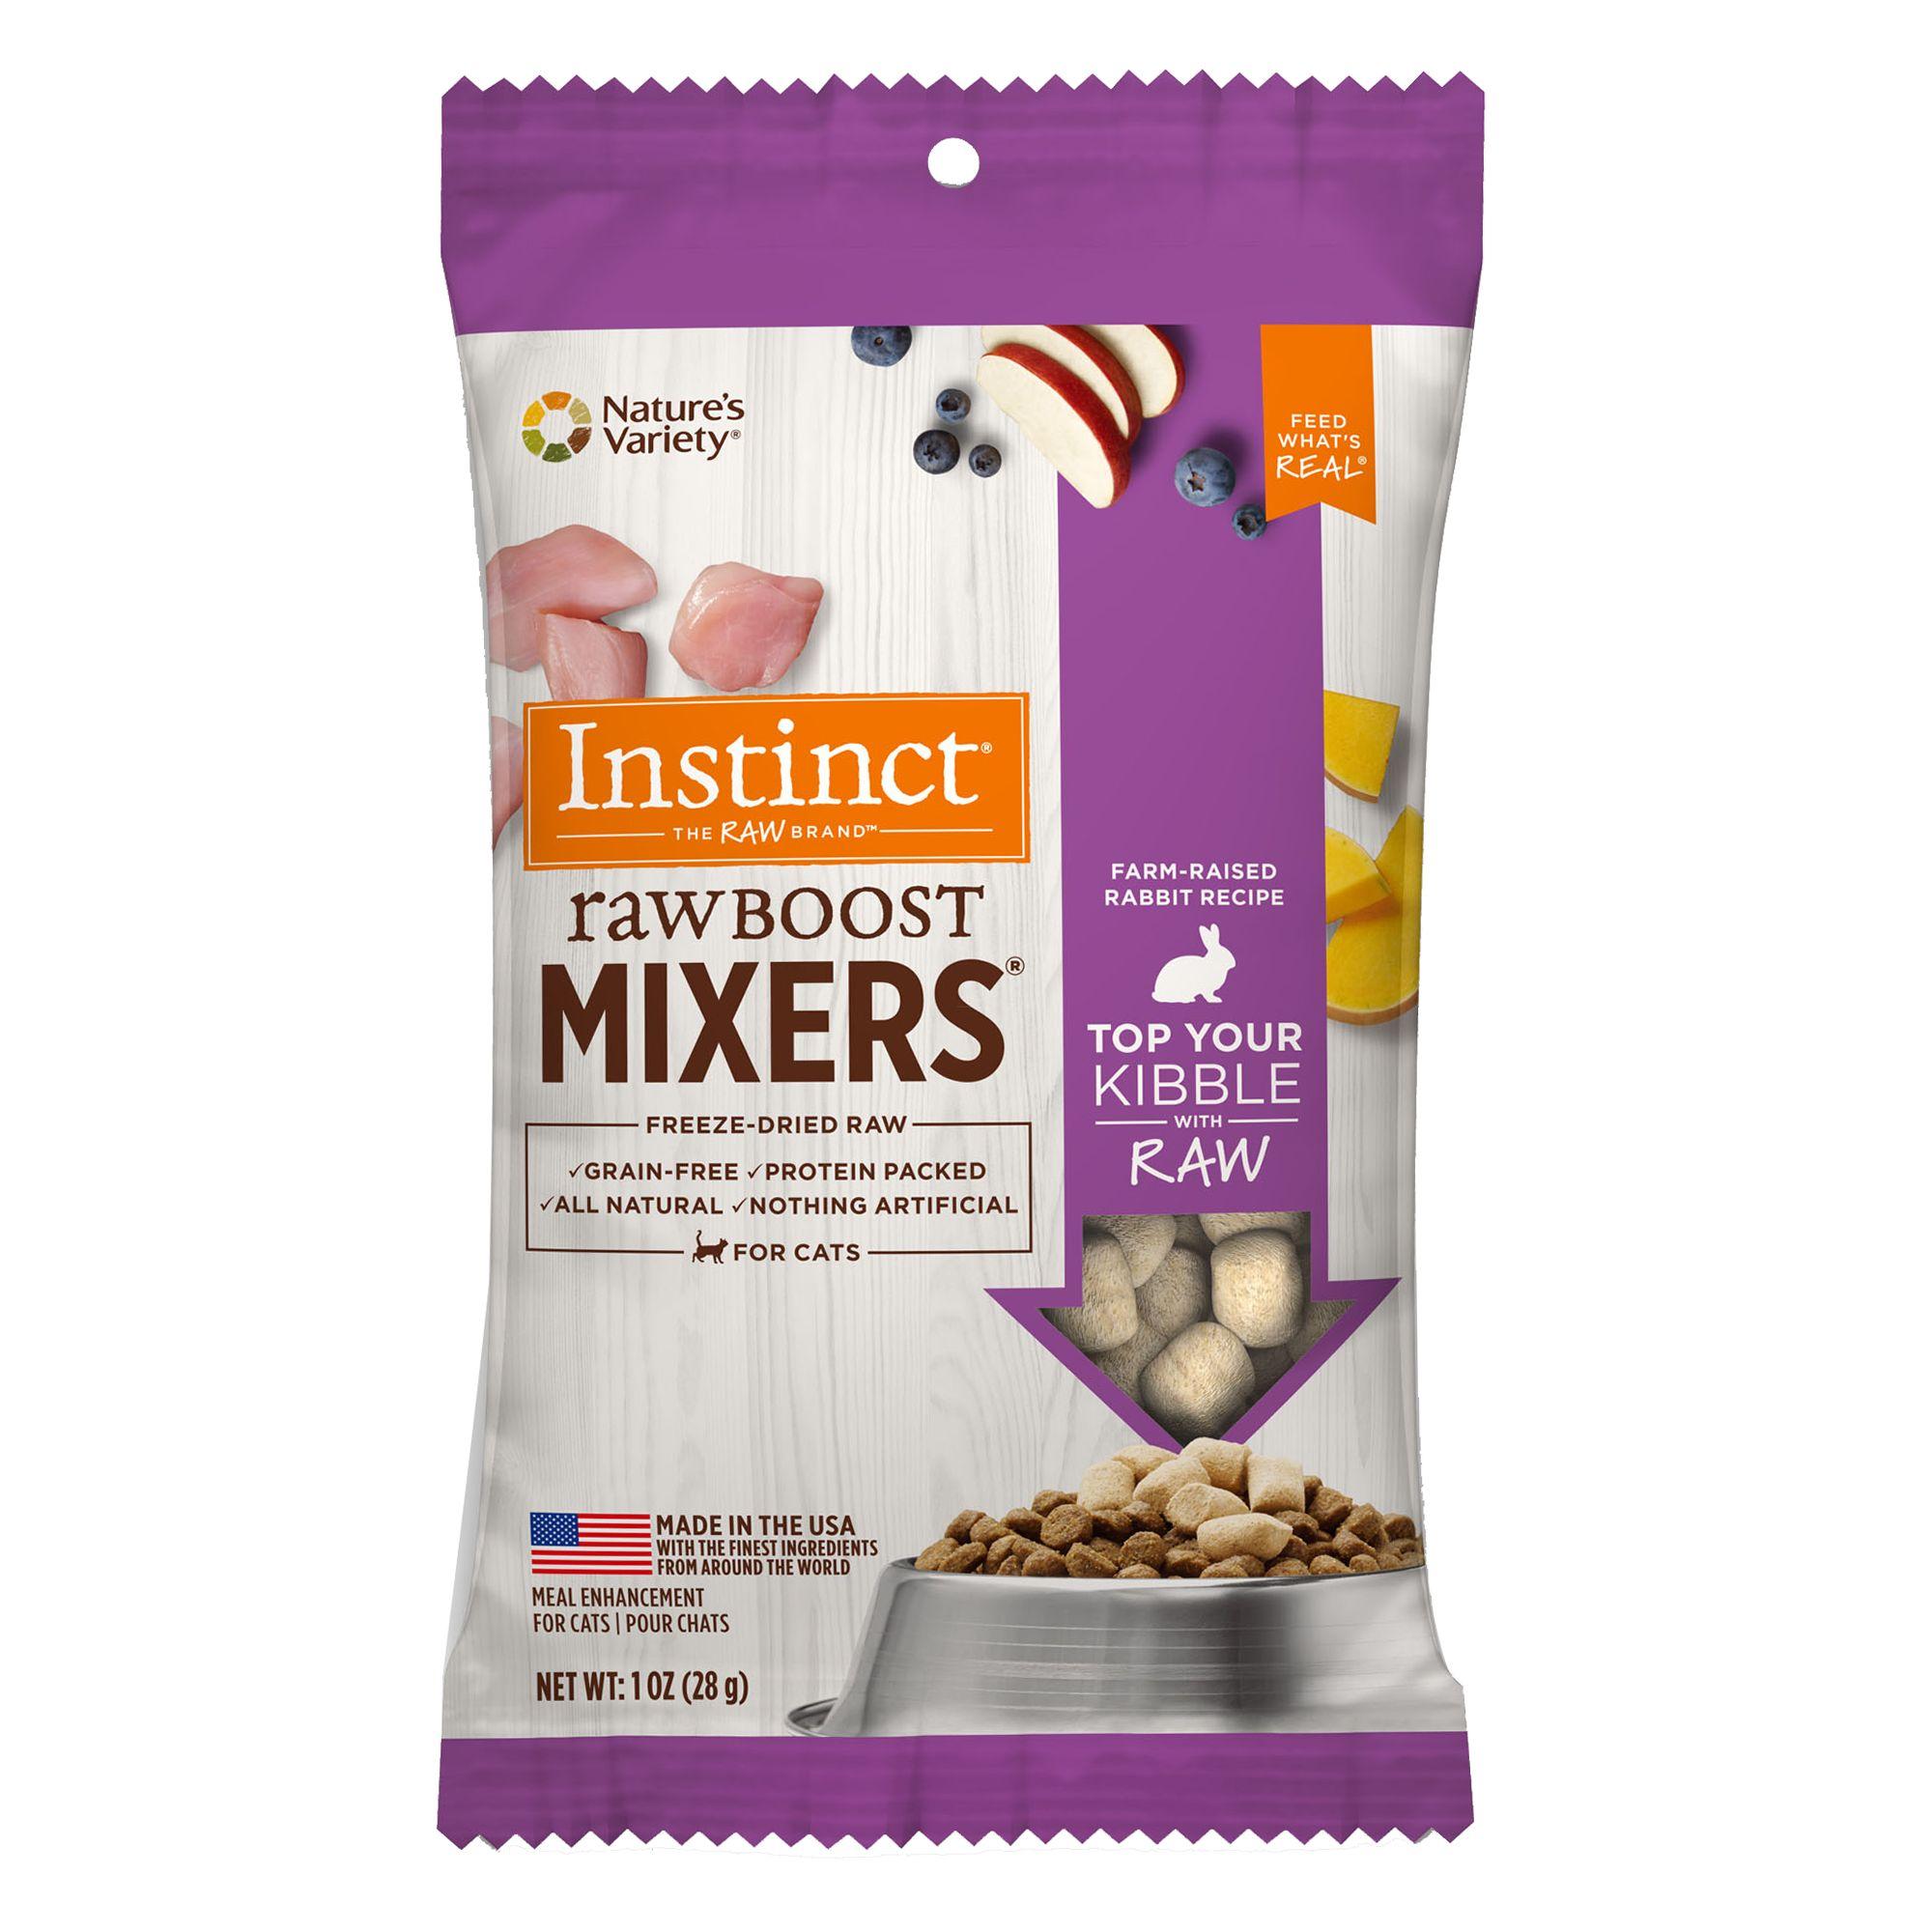 Nature's Variety® Instinct® Raw Boost Mixers Cat Foo